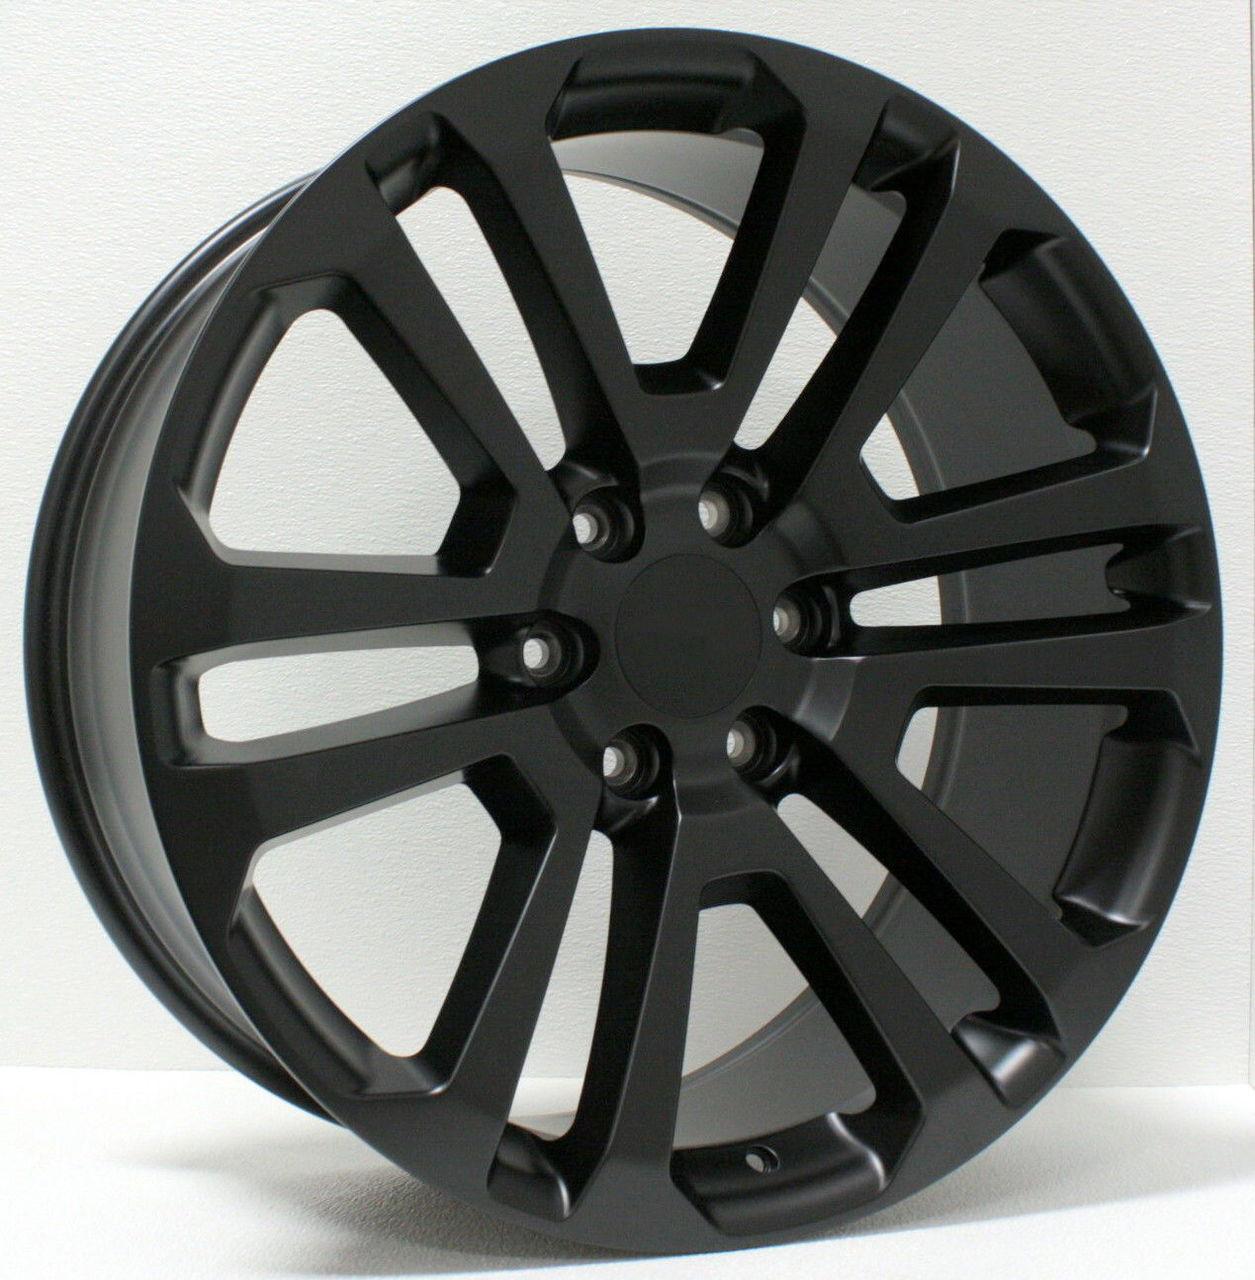 Gmc Savana 3500 >> GMC Black Split Spoke 22 inch Wheels Rims